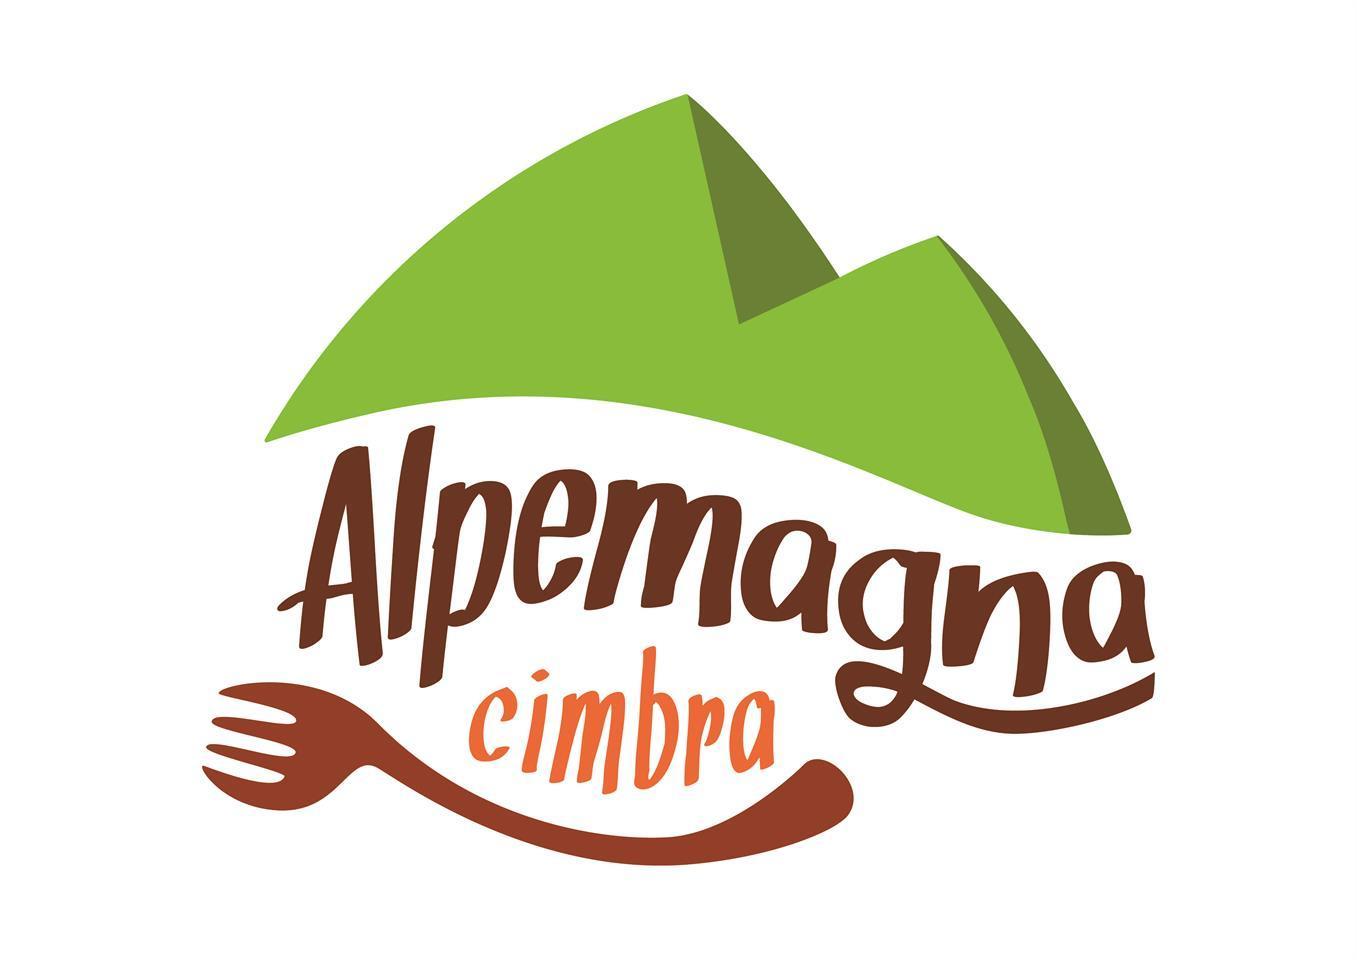 Alpemagna Cimbra